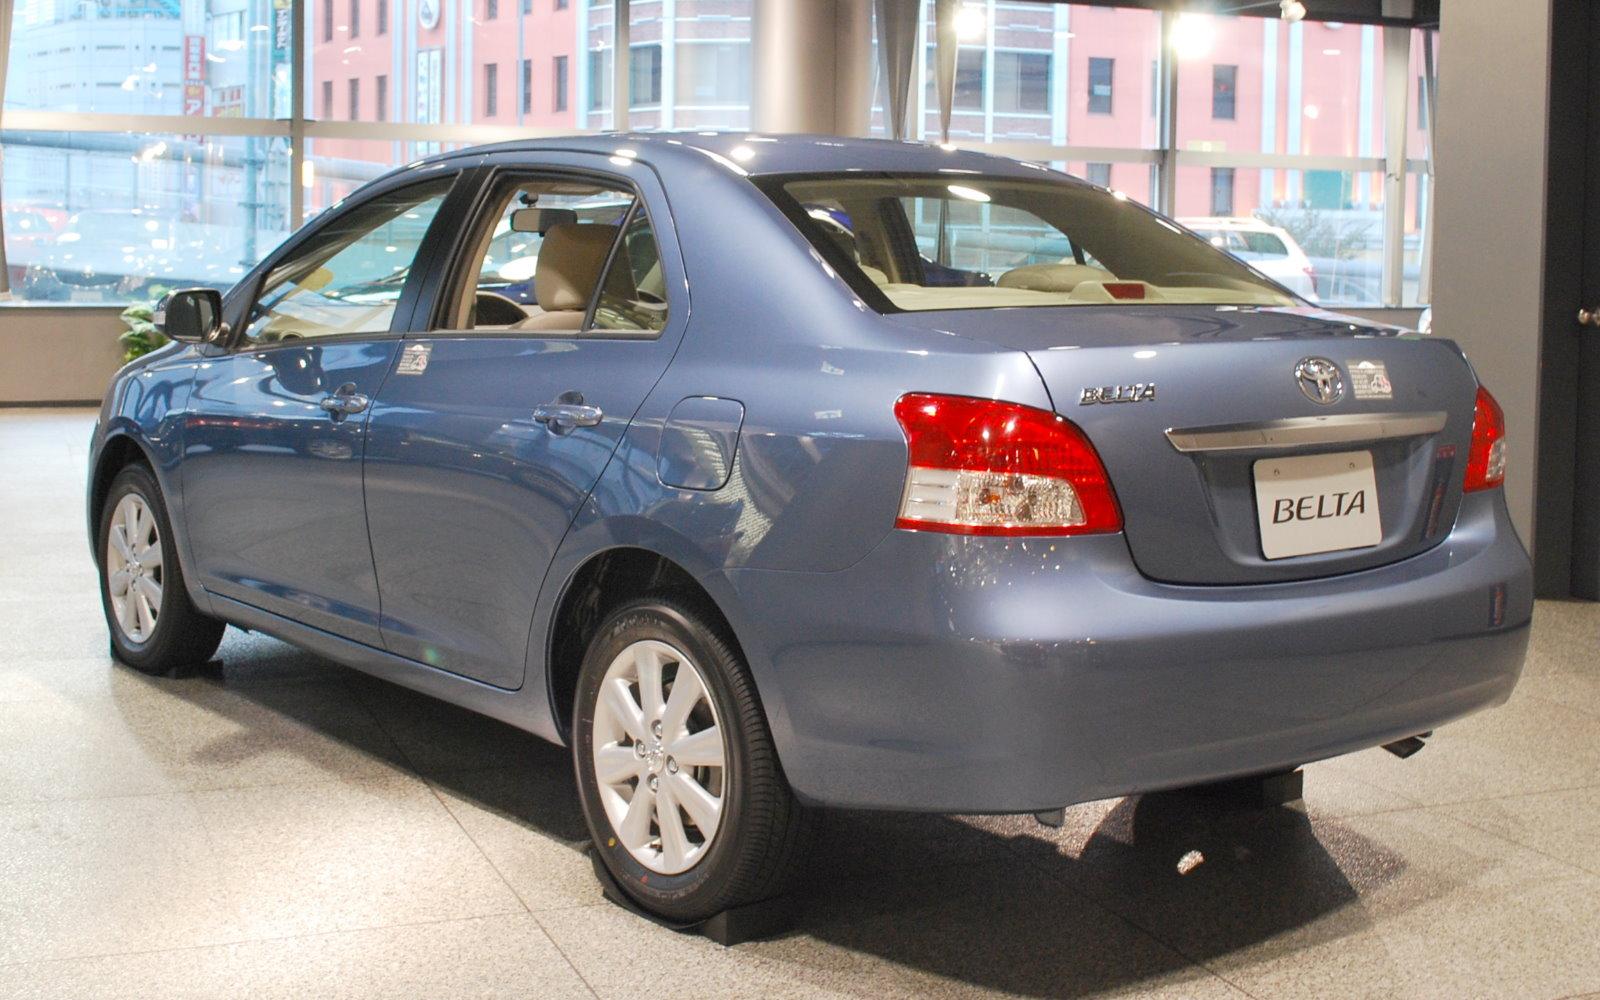 Toyota Belta 2012 Exterior Rear View